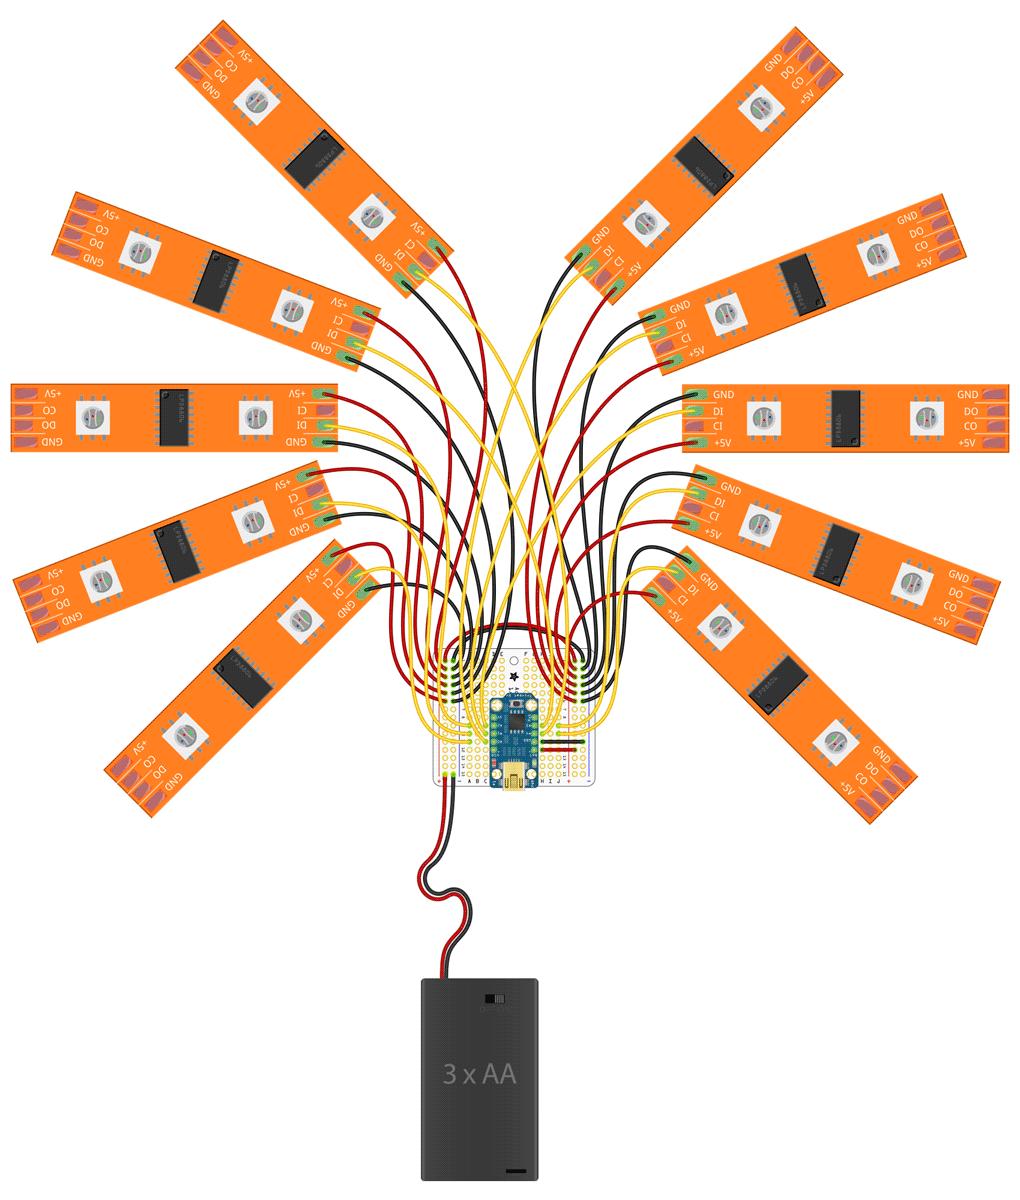 led_strips_Hair-Circuit-Diagram.png